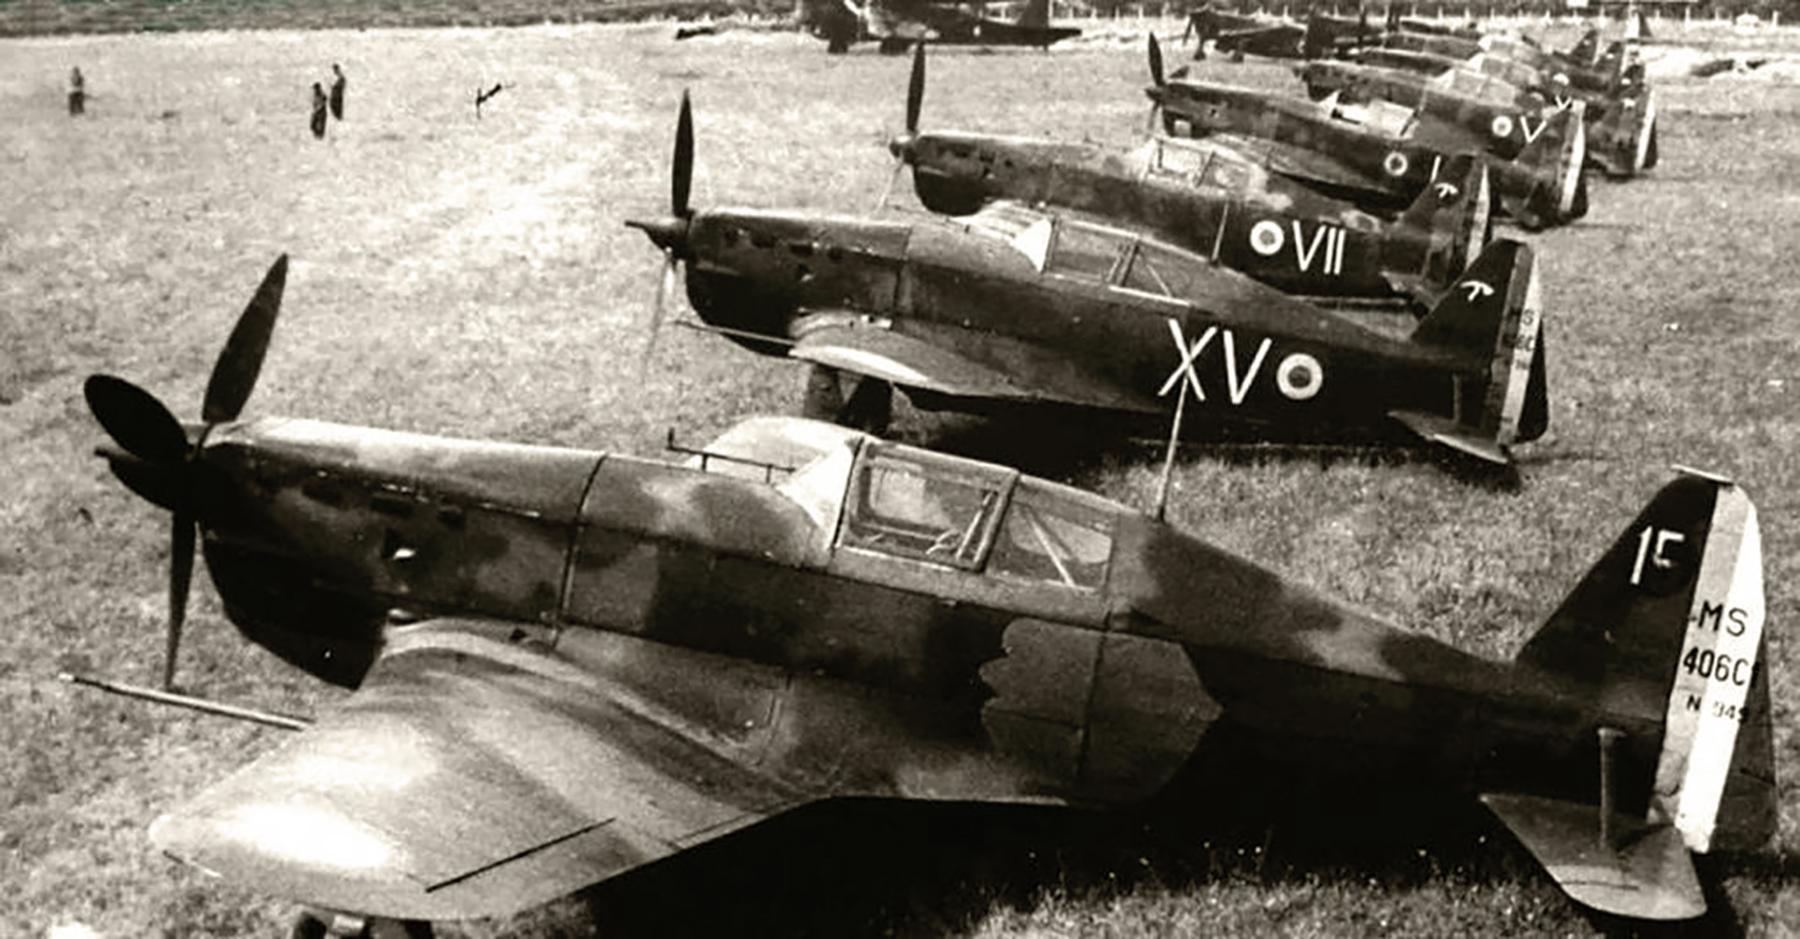 French Airforce Morane Saulnier MS 406C1 sn949 GC I.2 White 15 France 1940 web 01